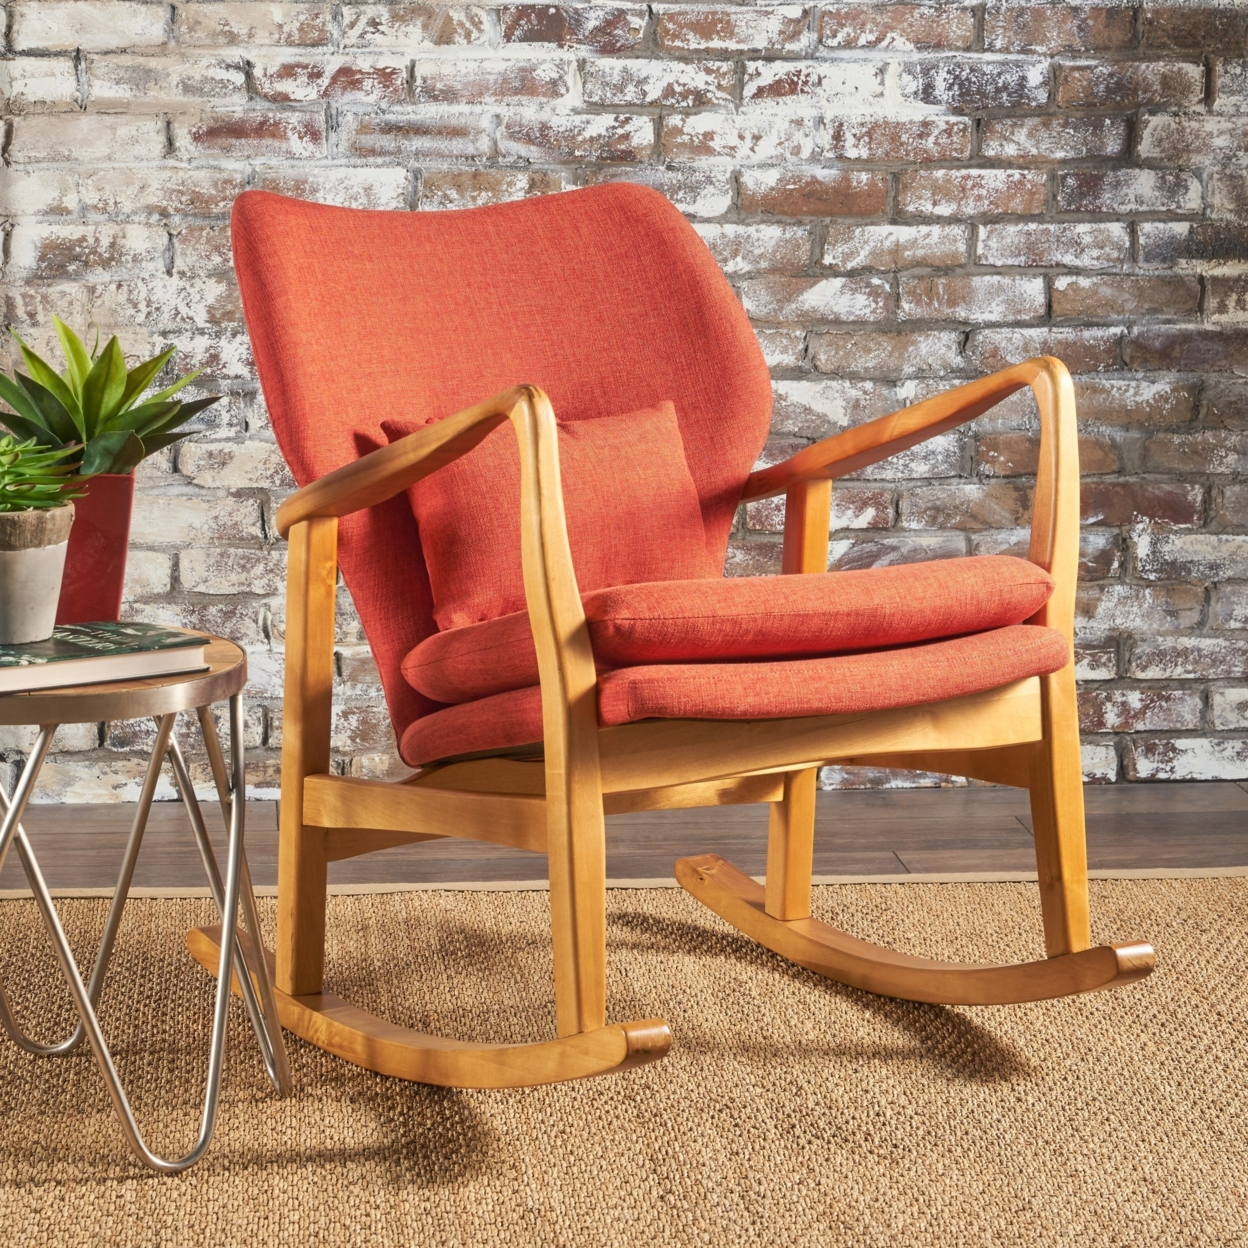 Balen Mid Century Modern Fabric Rocking Chair snowflake christmas balls sparkling winter print waterproof table cloth